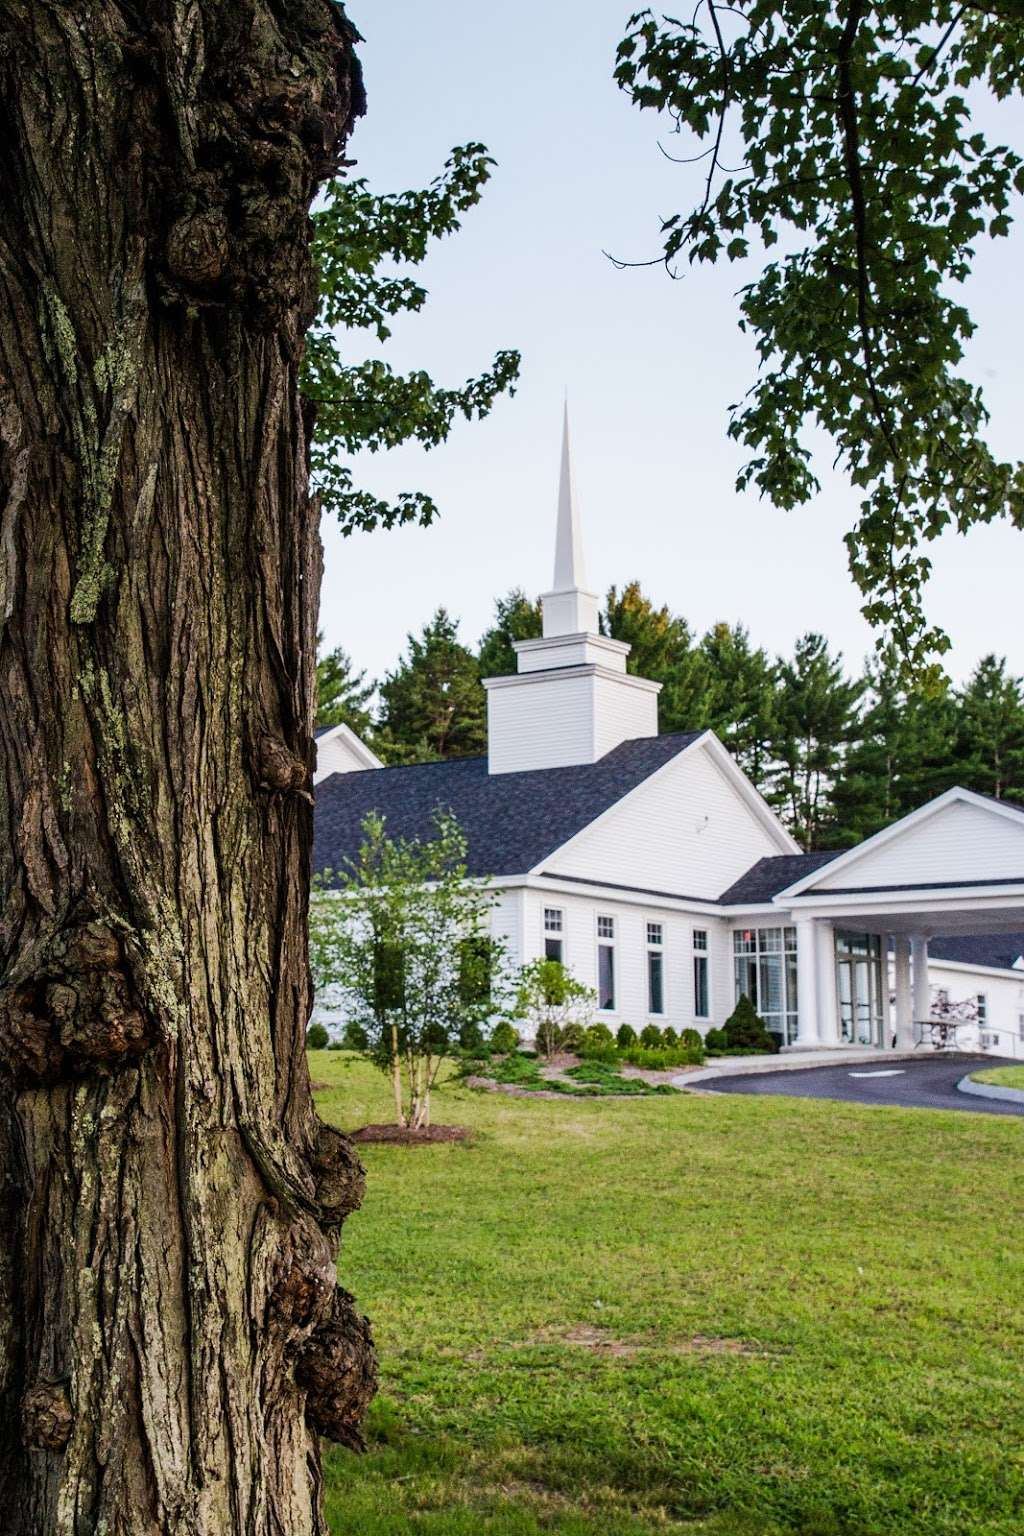 Grace Covenant Church - church  | Photo 7 of 10 | Address: 11 Colby Rd, Litchfield, NH 03052, USA | Phone: (603) 429-2979